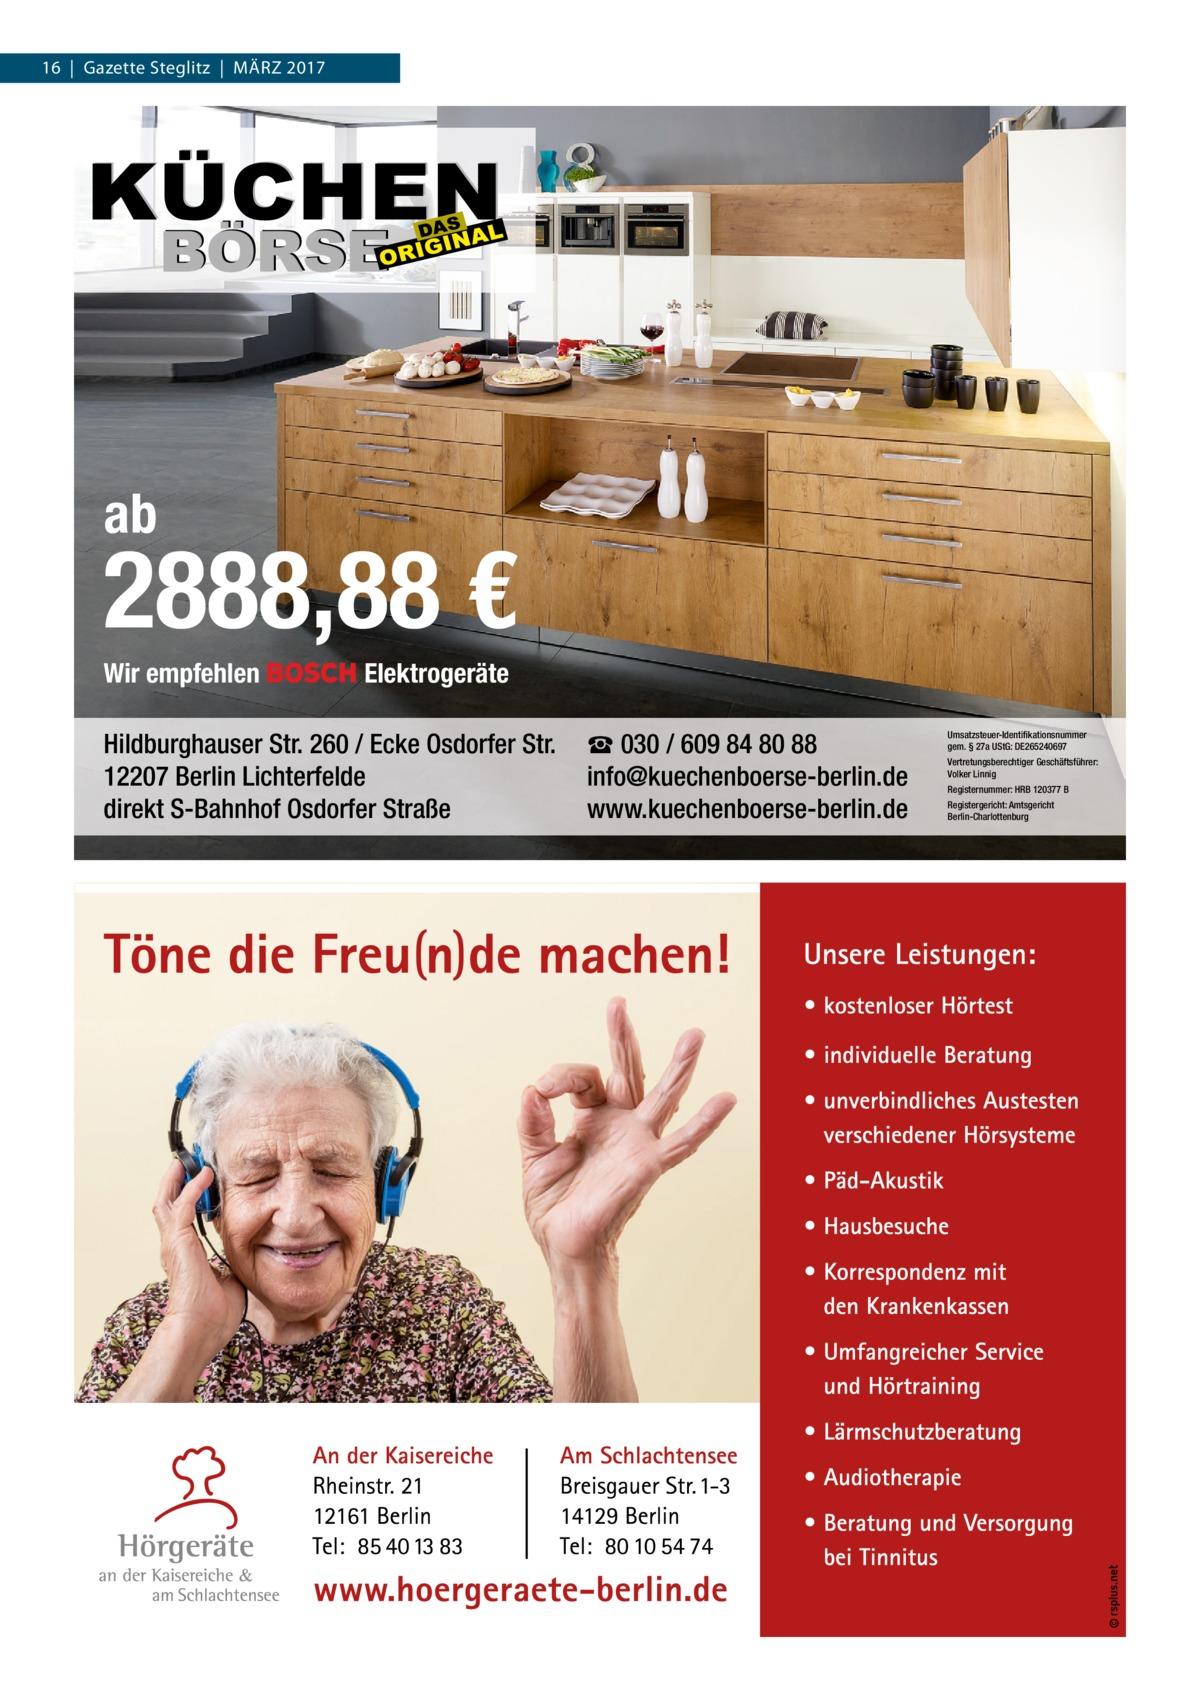 16|Gazette Steglitz|März 2017  ab  2888,88 € Wir empfehlen  Elektrogeräte  Hildburghauser Str. 260 / Ecke Osdorfer Str. 12207 Berlin Lichterfelde direkt S-Bahnhof Osdorfer Straße  ☎ 030 / 609 84 80 88 info@kuechenboerse-berlin.de www.kuechenboerse-berlin.de  Umsatzsteuer-Identifikationsnummer gem. § 27a UStG: DE265240697 Vertretungsberechtiger Geschäftsführer: Volker Linnig Registernummer: HRB 120377 B Registergericht: Amtsgericht Berlin-Charlottenburg